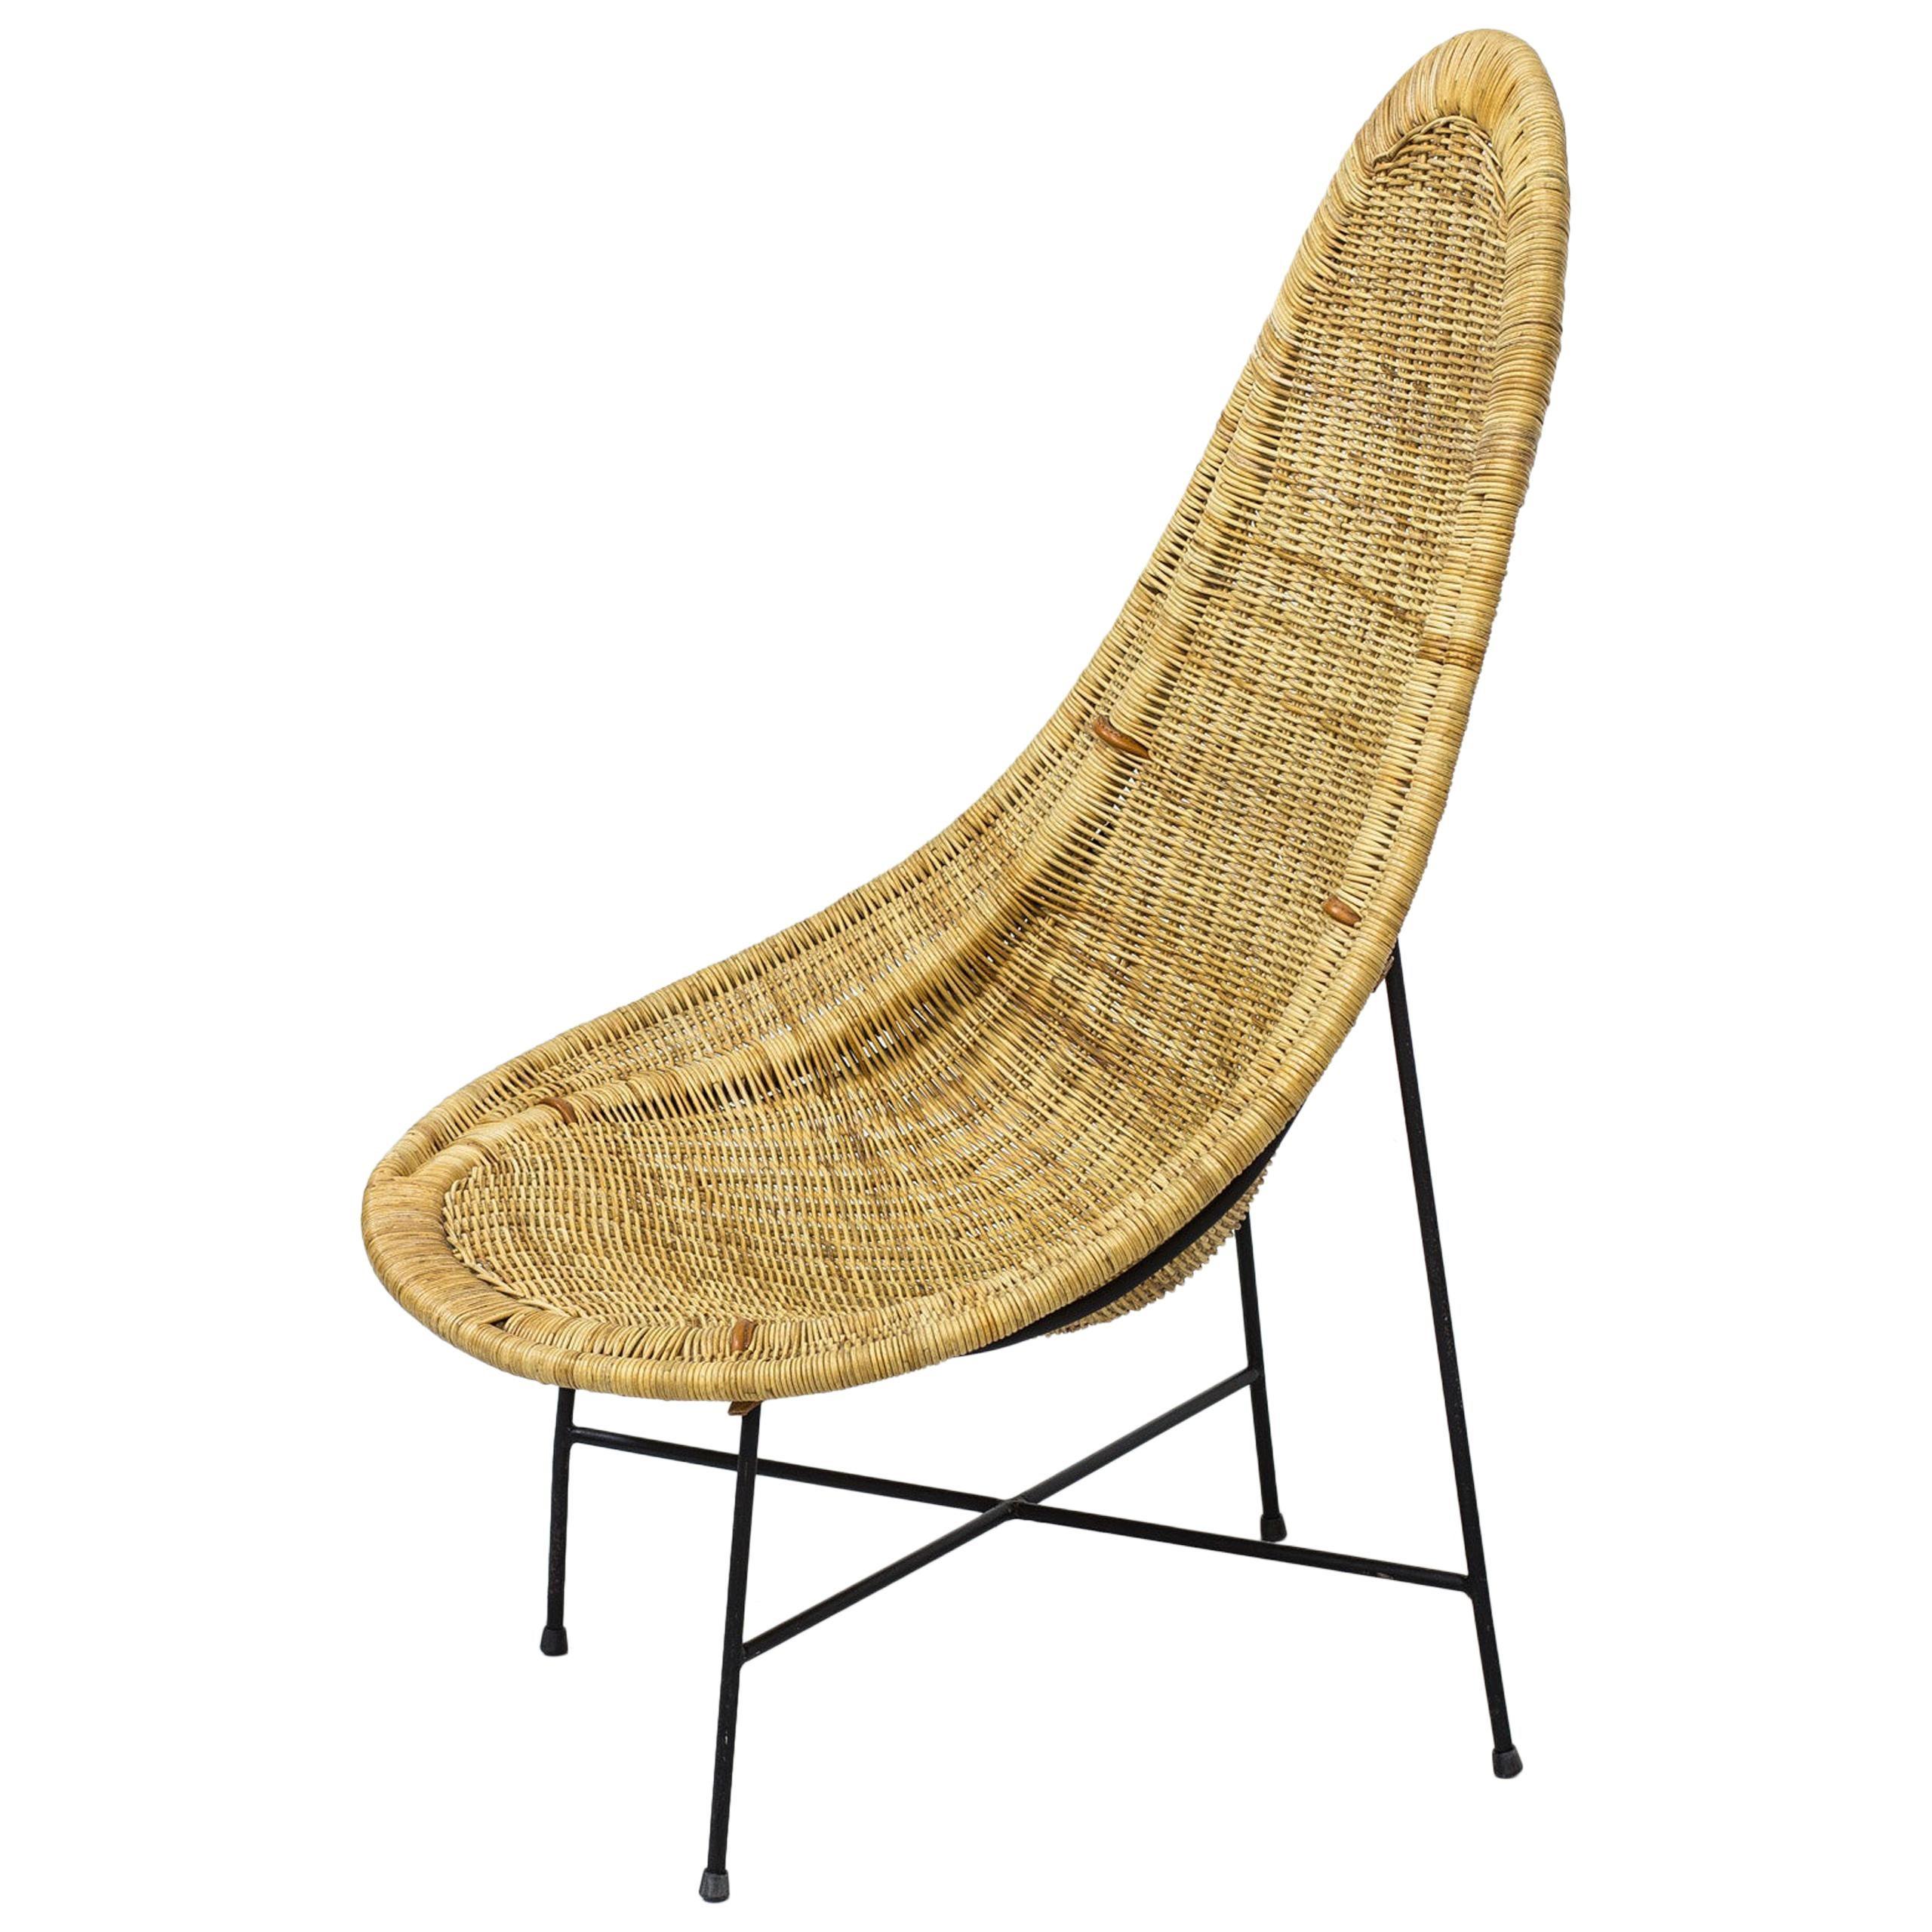 "Lounge Chair ""Kraal"" by Kerstin Hörlin-Holmquist for Nordiska Kompaniet No.2"